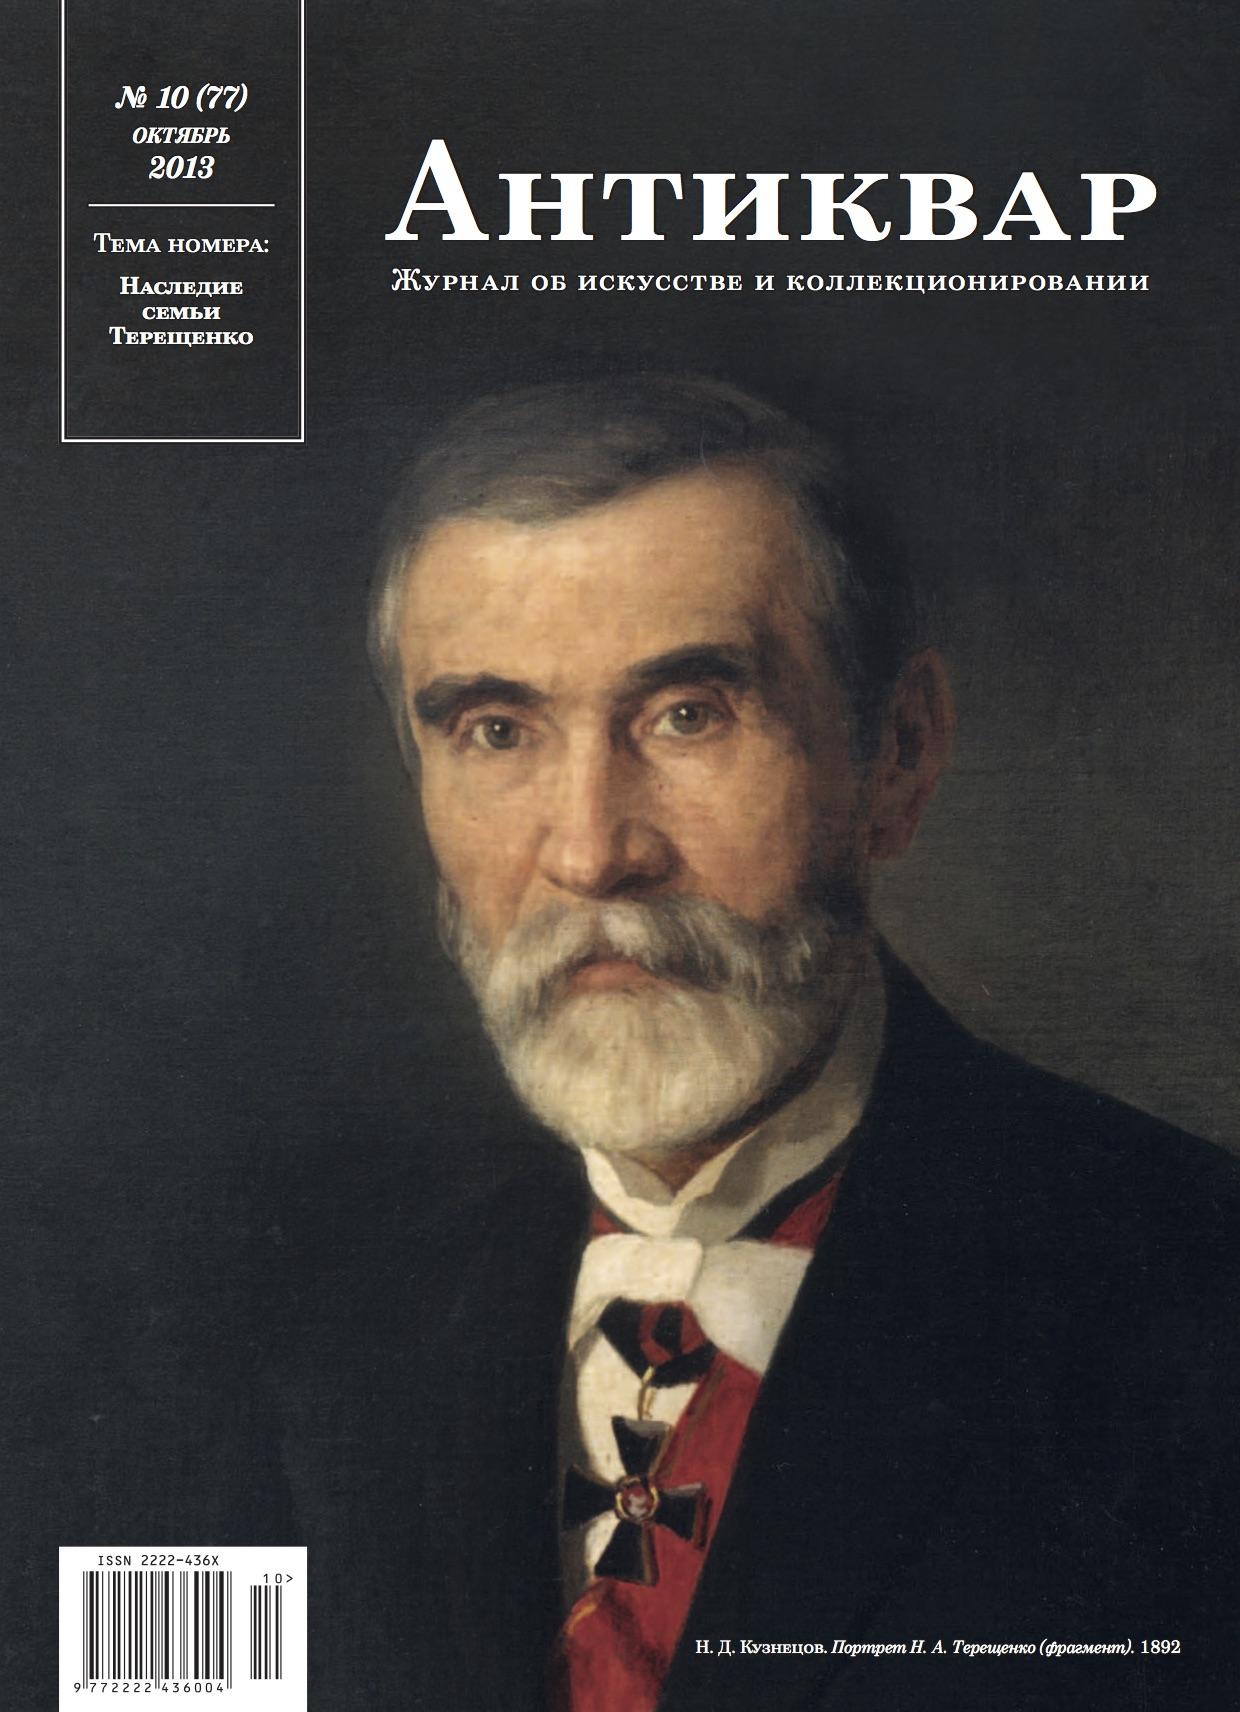 Журнал Антиквар #77: Наследие семьи Терещенко